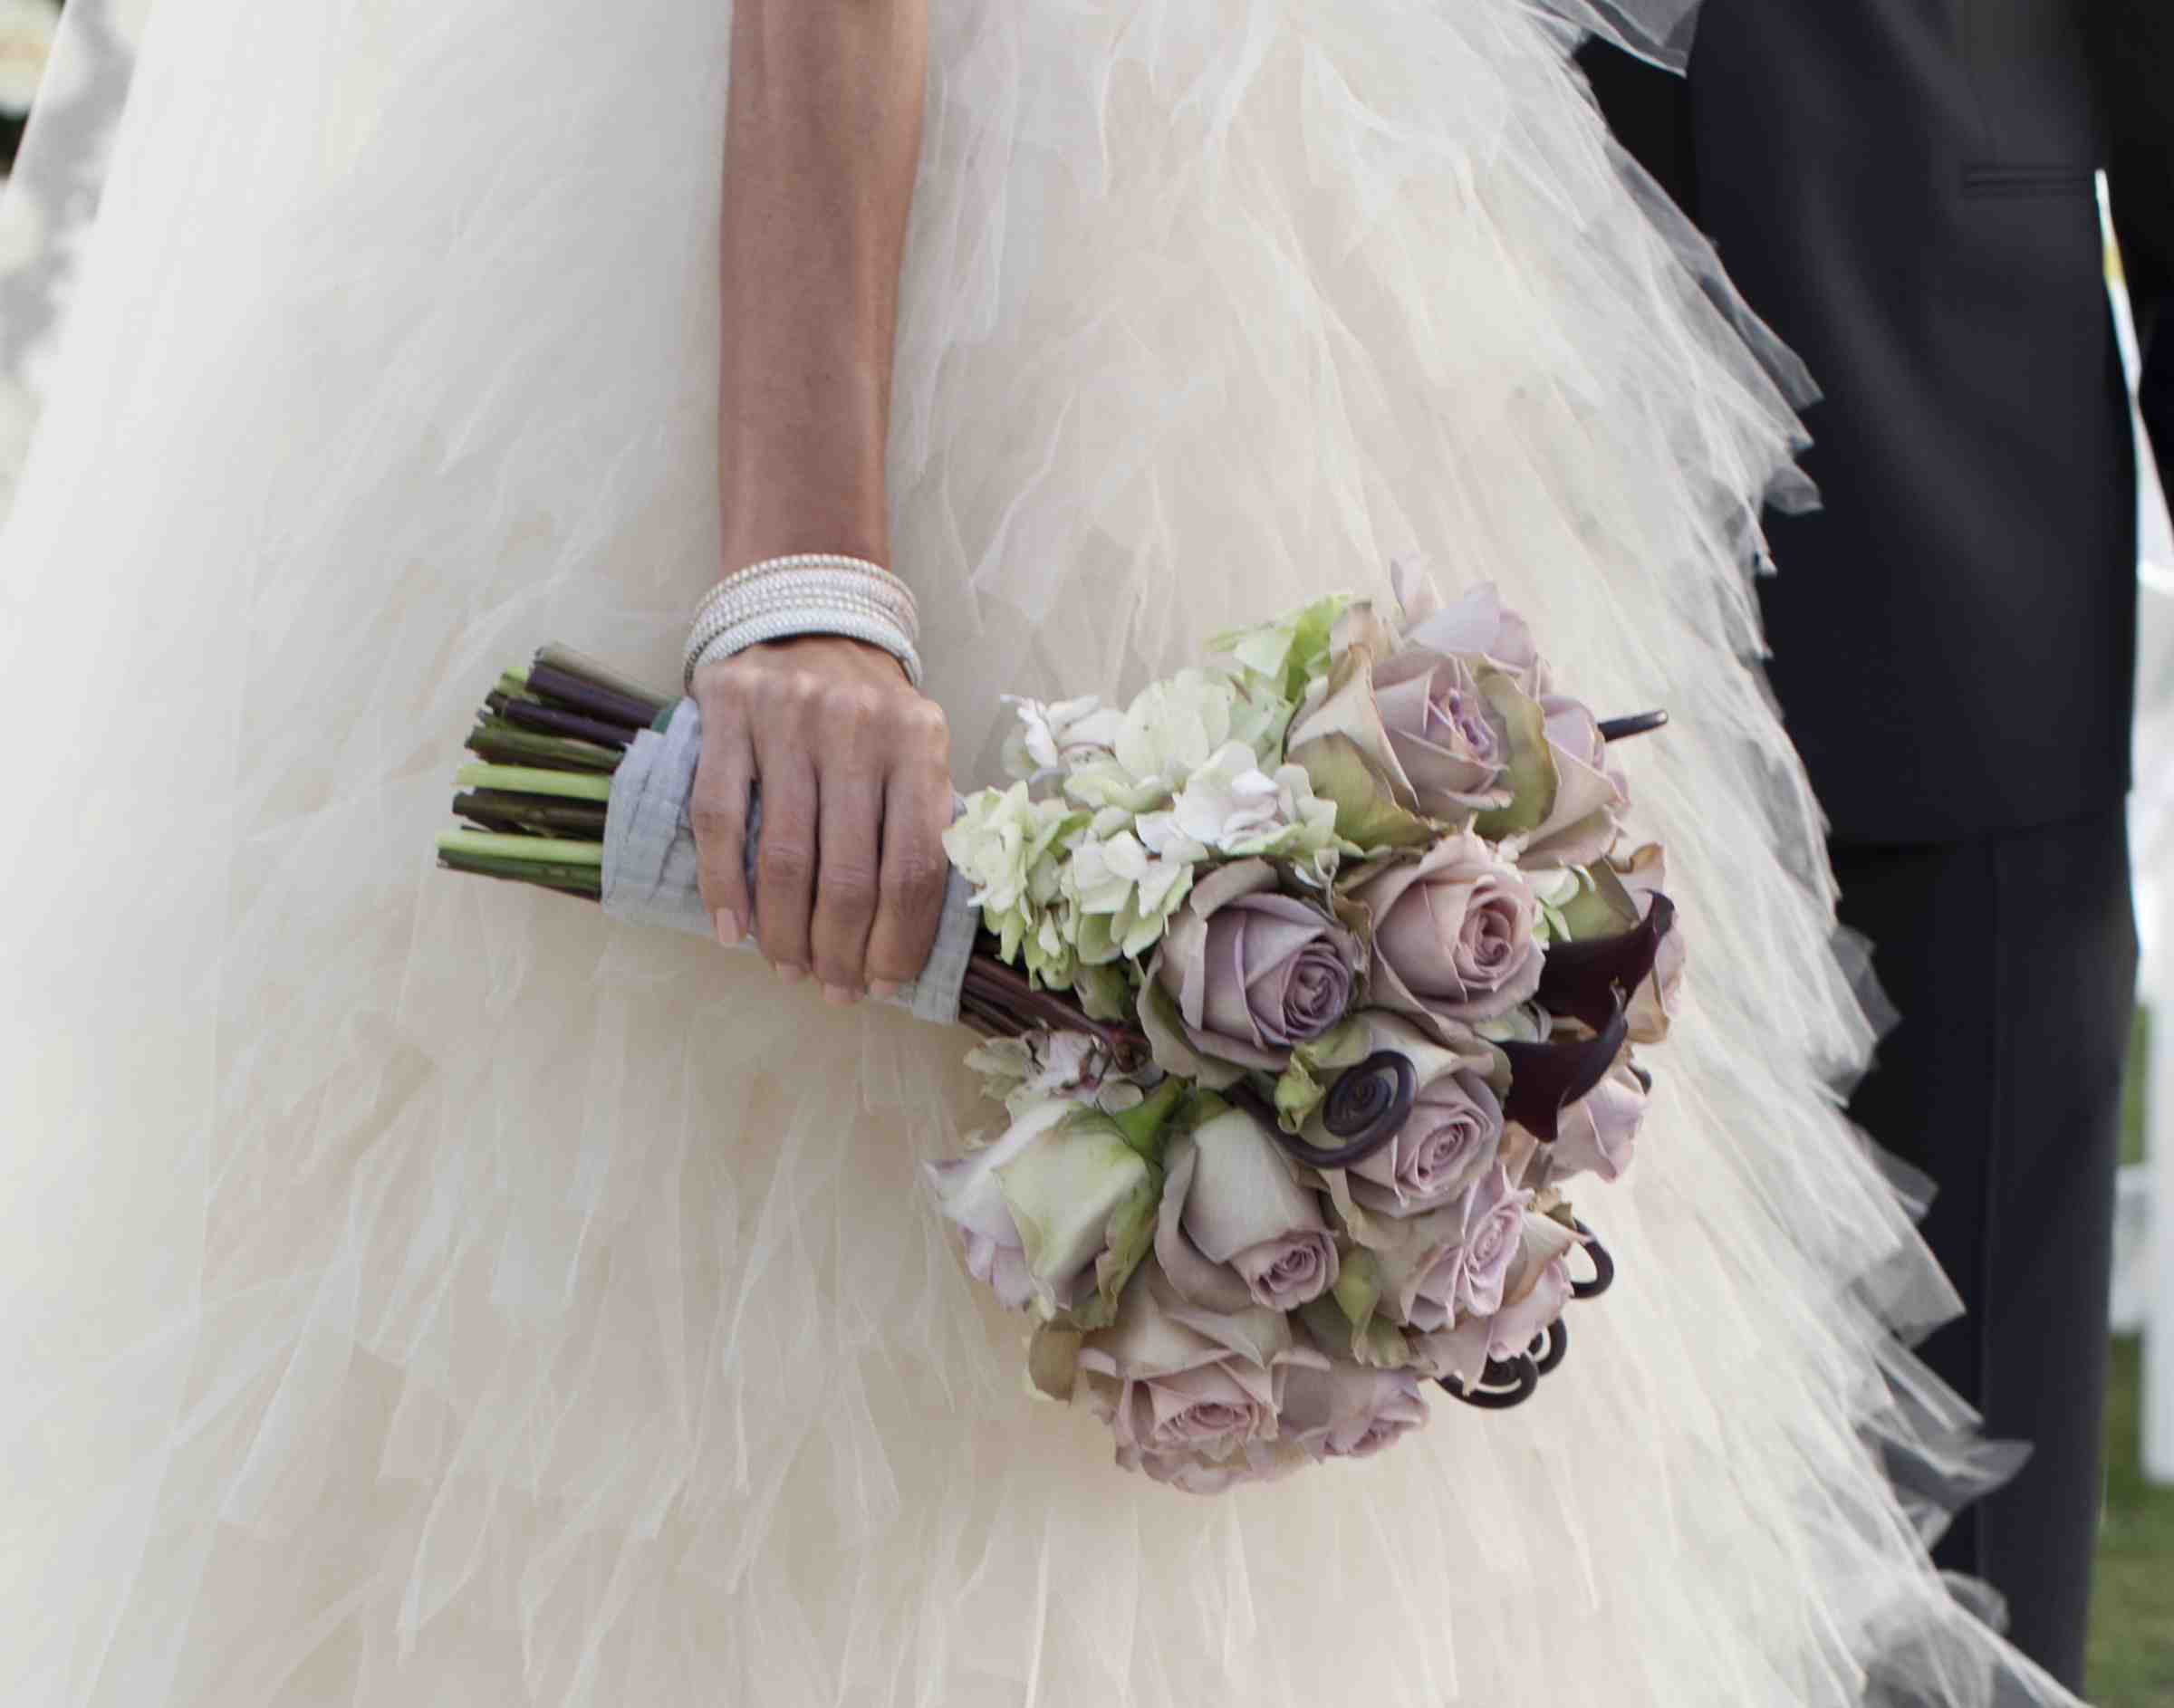 Bride holding lavender wedding bouquet